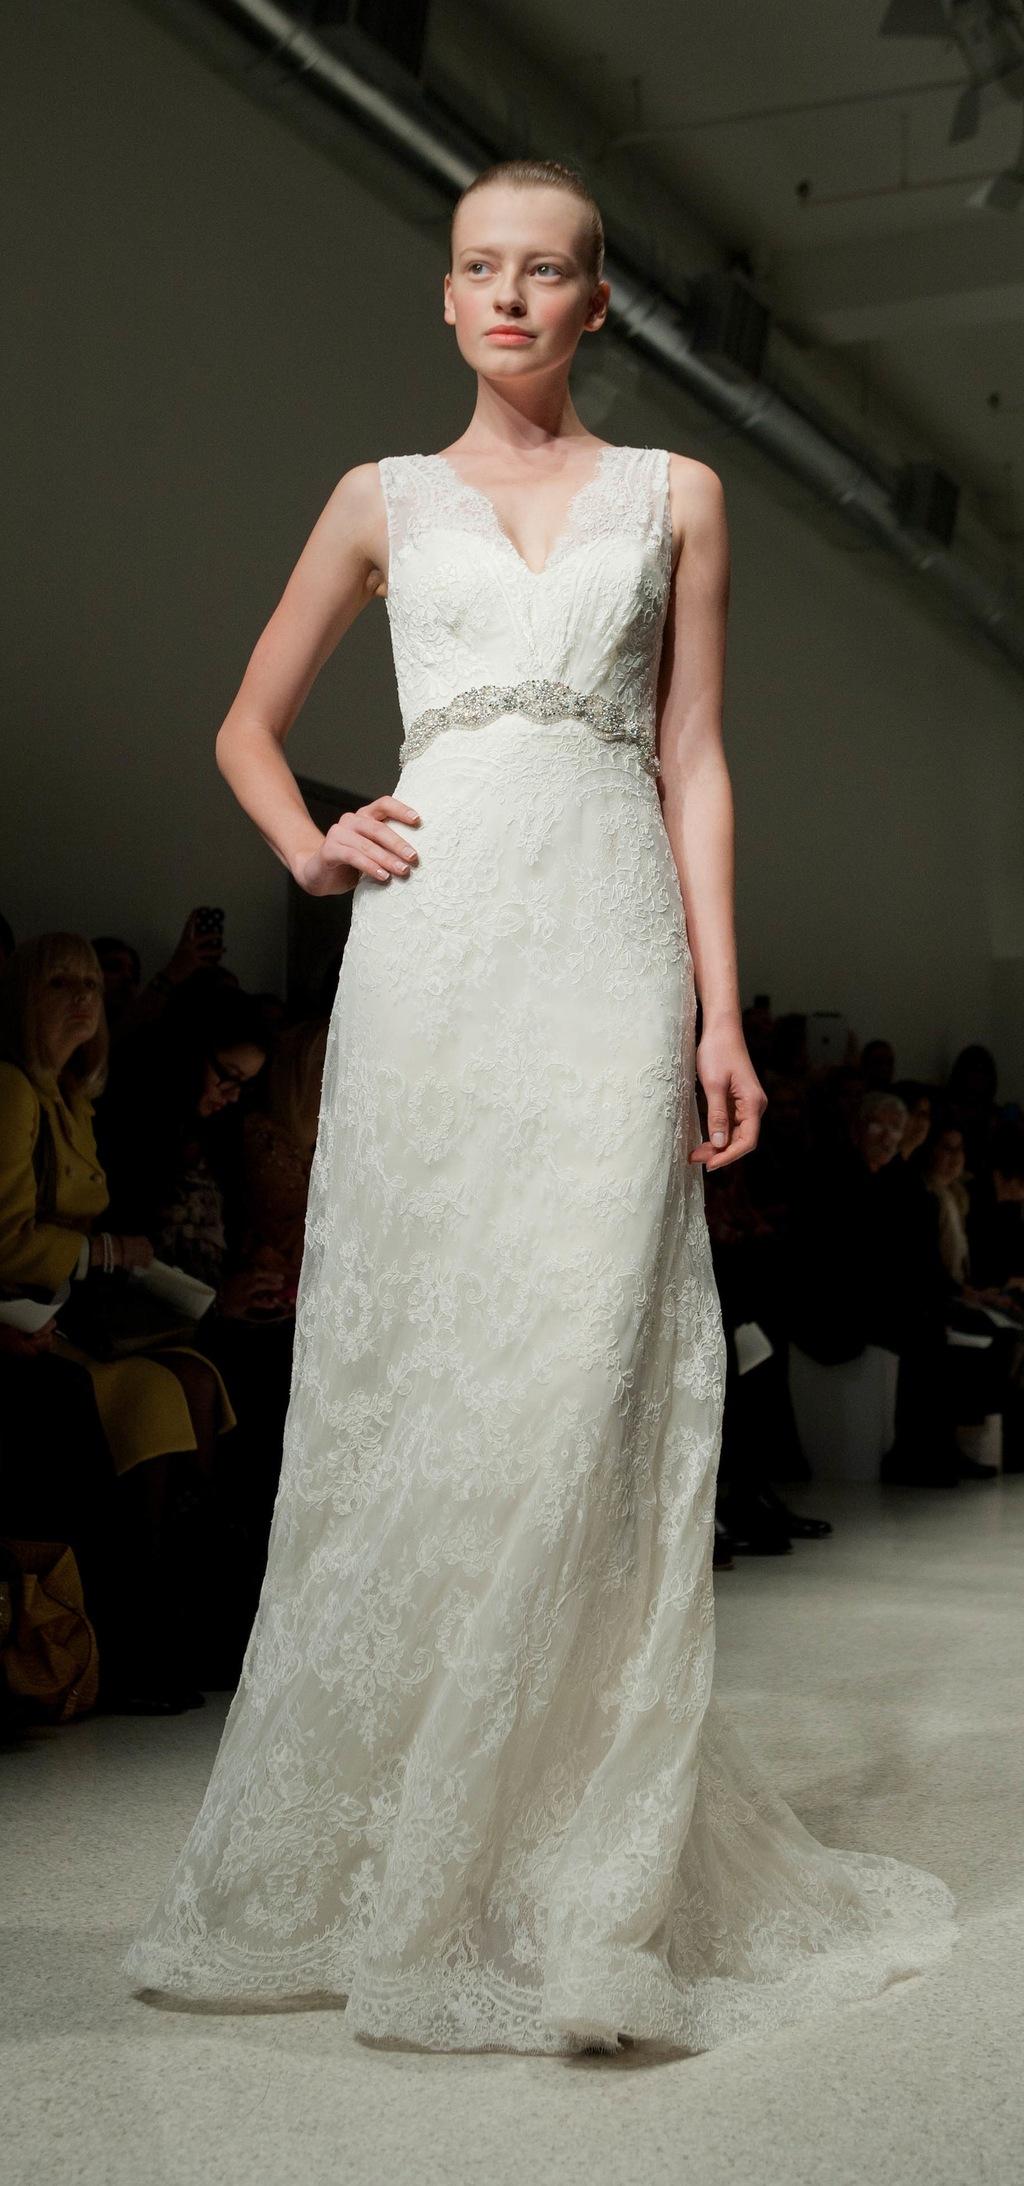 2012_wedding_dress_christos_bridal_gowns_irina.full